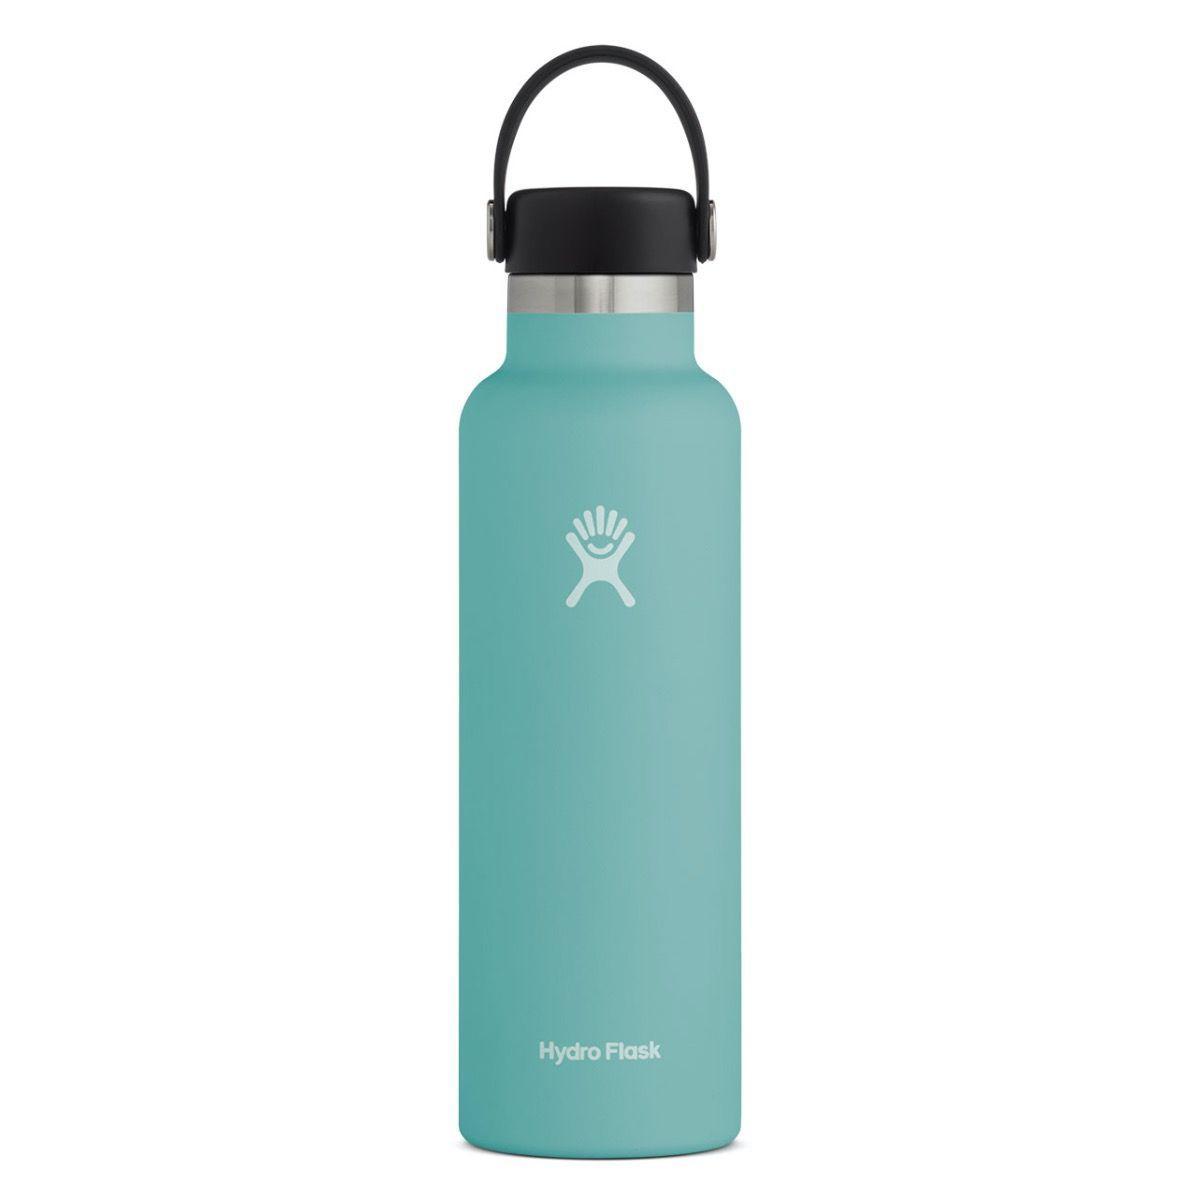 Hydro Flask 21 oz Standard Mouth Bottle - Color: Alpine - Size: 21OZ, Alpine, large, image 1